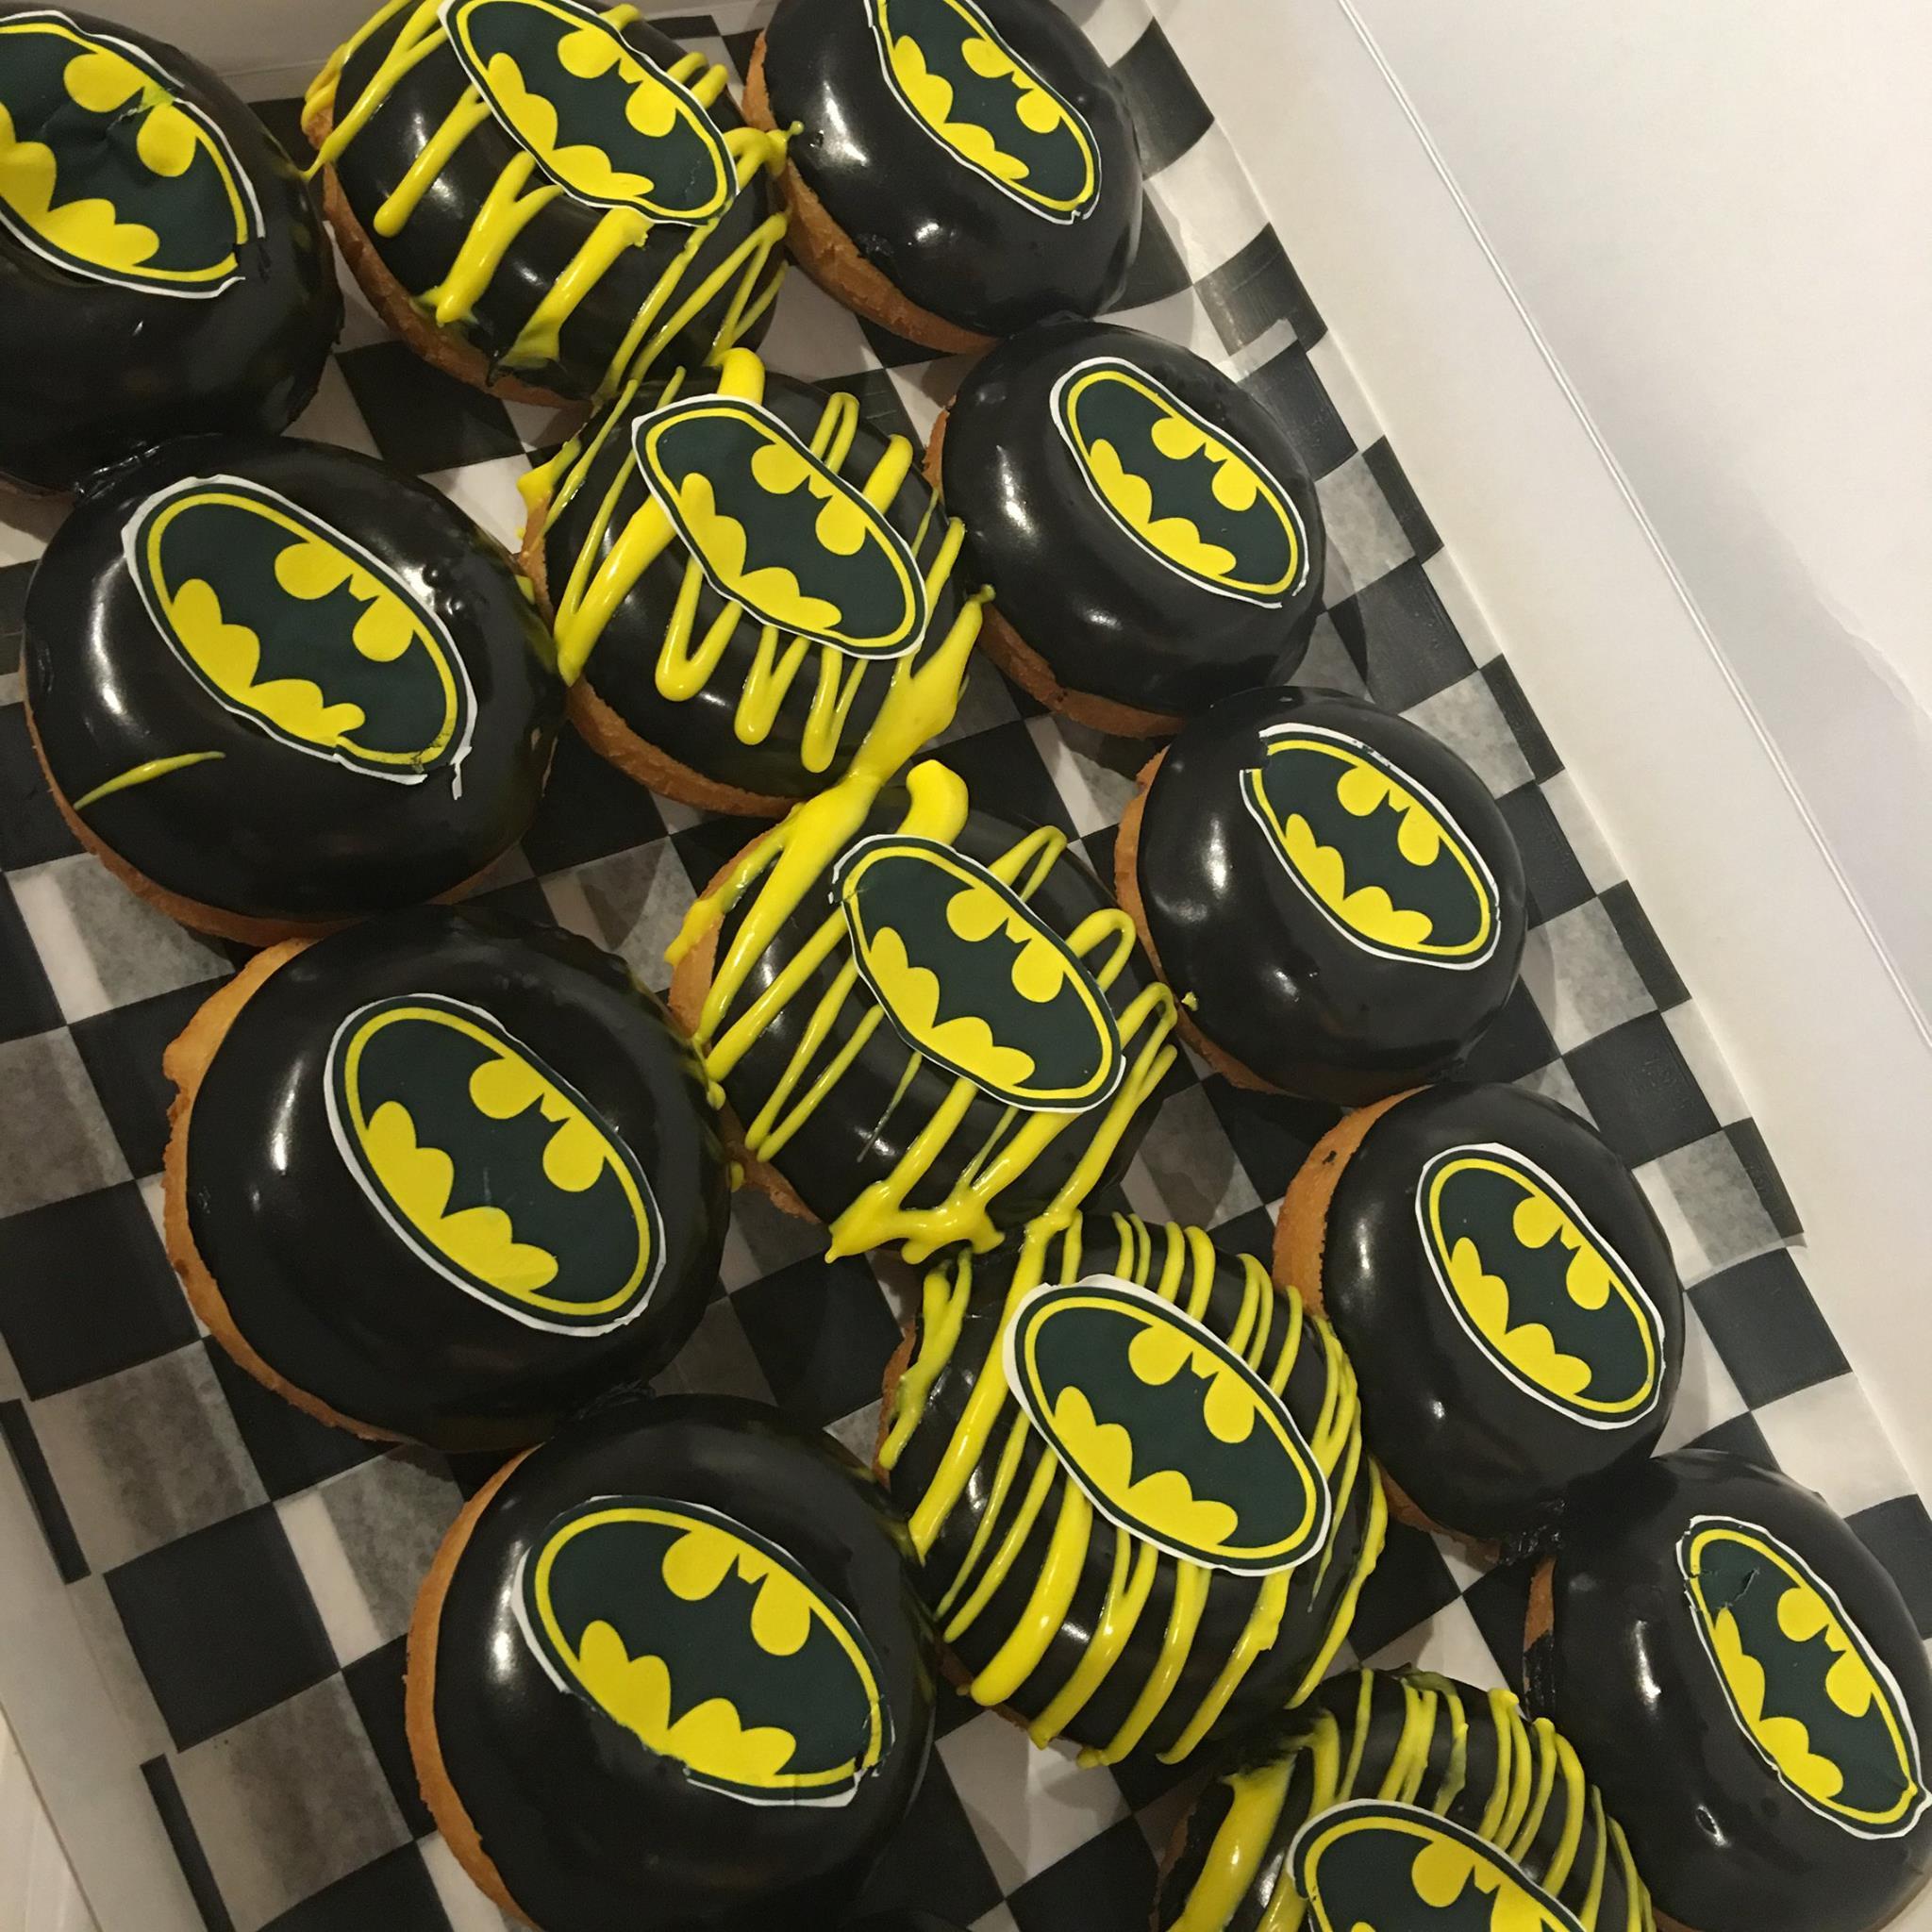 Batman Donuts | Broad Street Dough Co